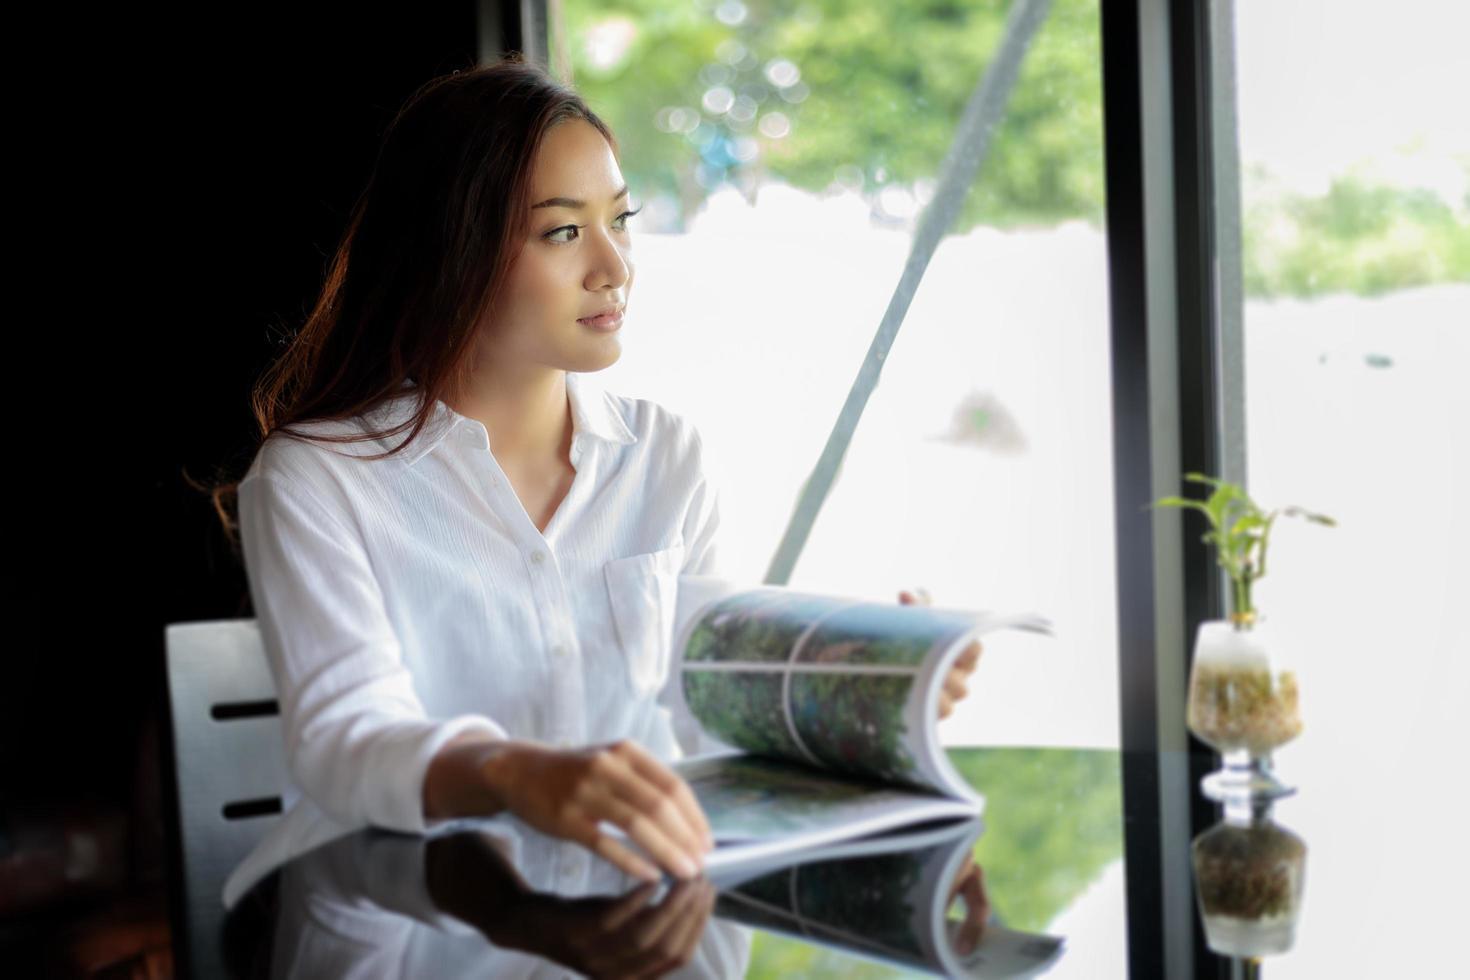 Aziatische vrouwen glimlachend en een boek lezen in café foto